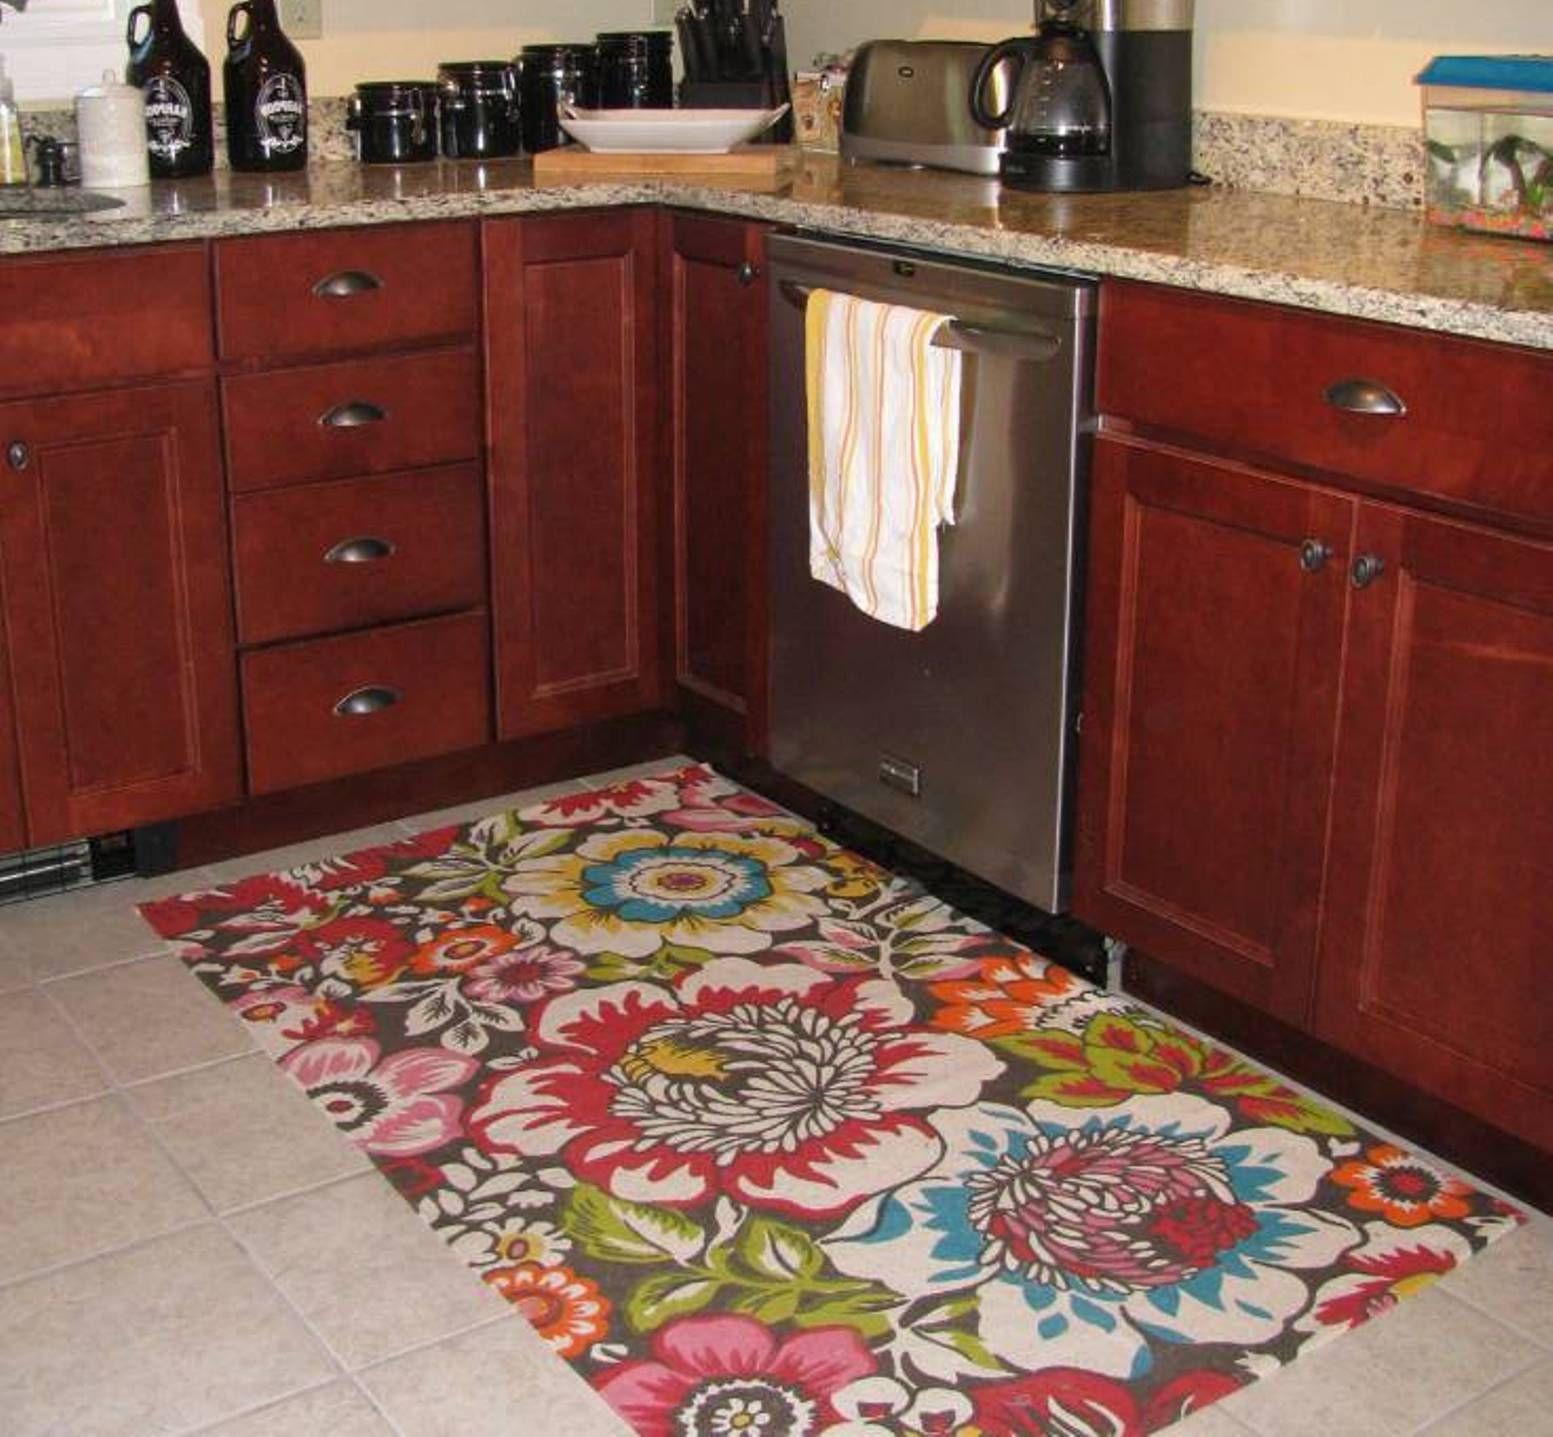 kitchen mats for hardwood floors of kitchen floor mats designer best interior wall paint check more at pertaining to kitchen floor mats designer best interior wall paint check more at http